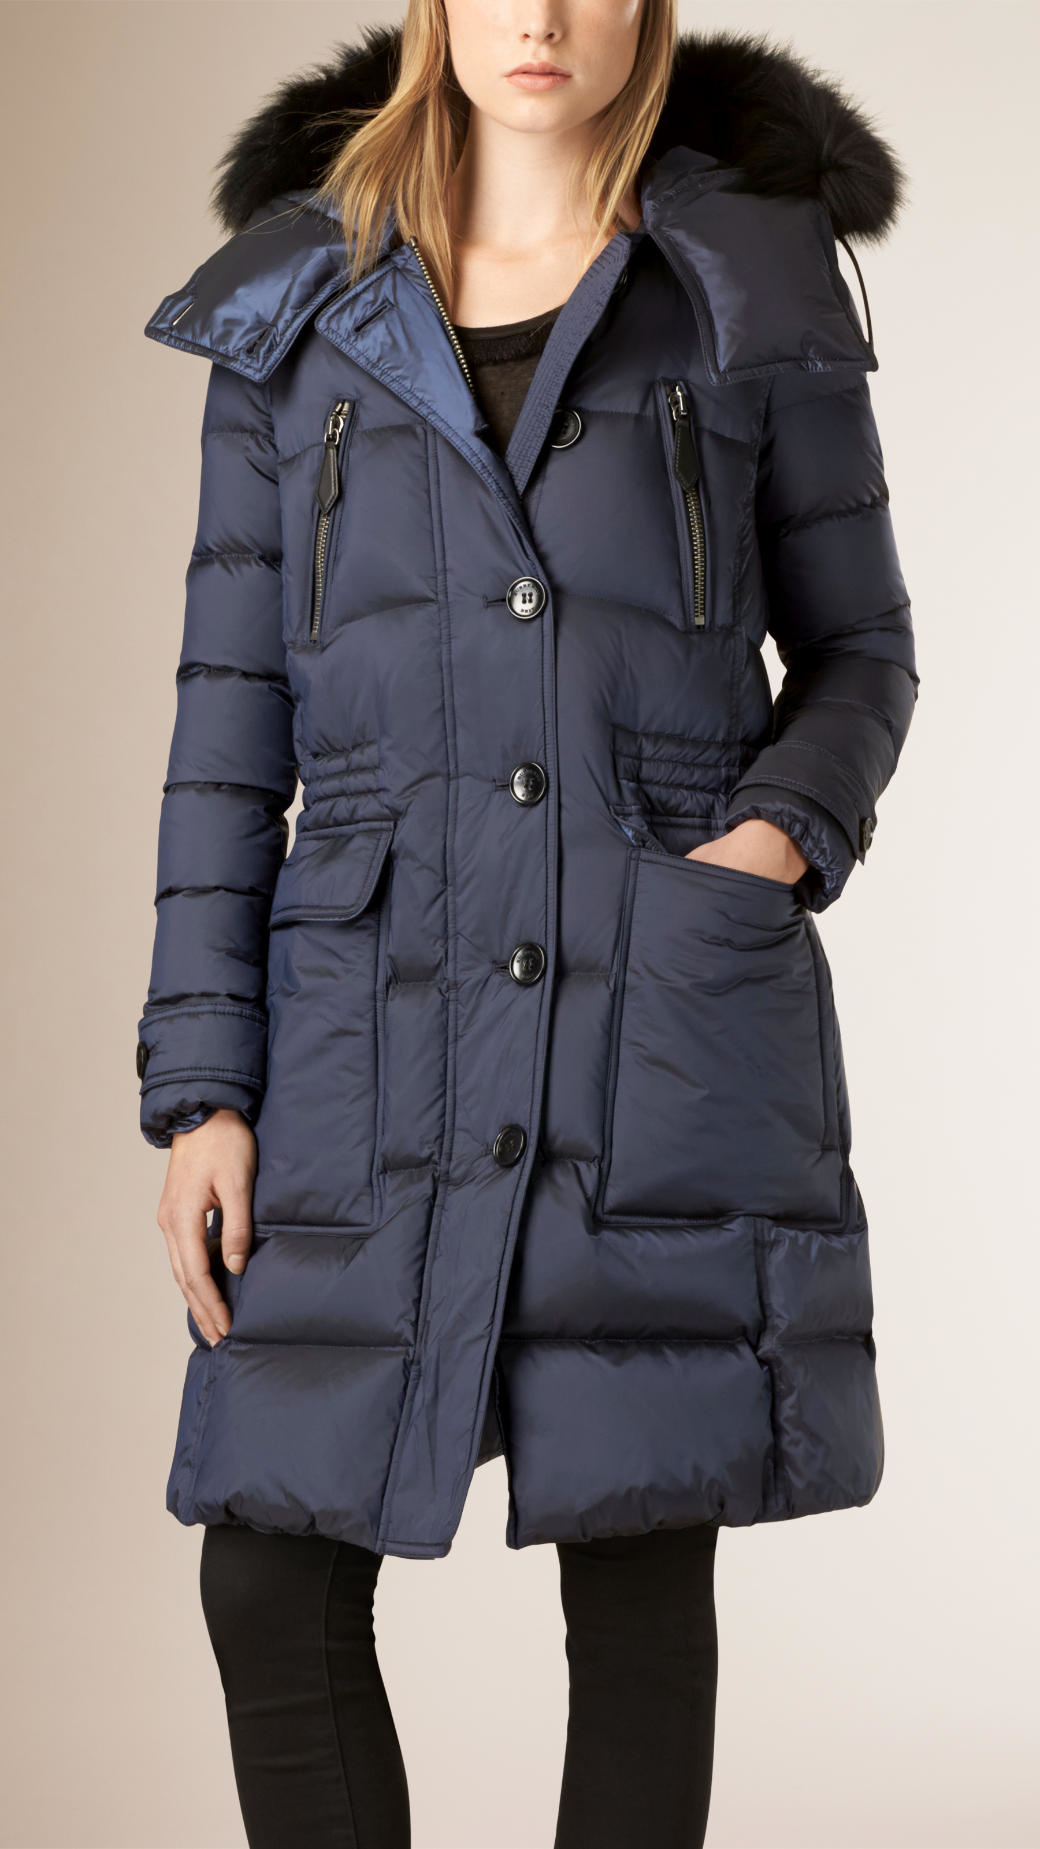 31f13d43c52 Burberry Jacket With Fur Hood